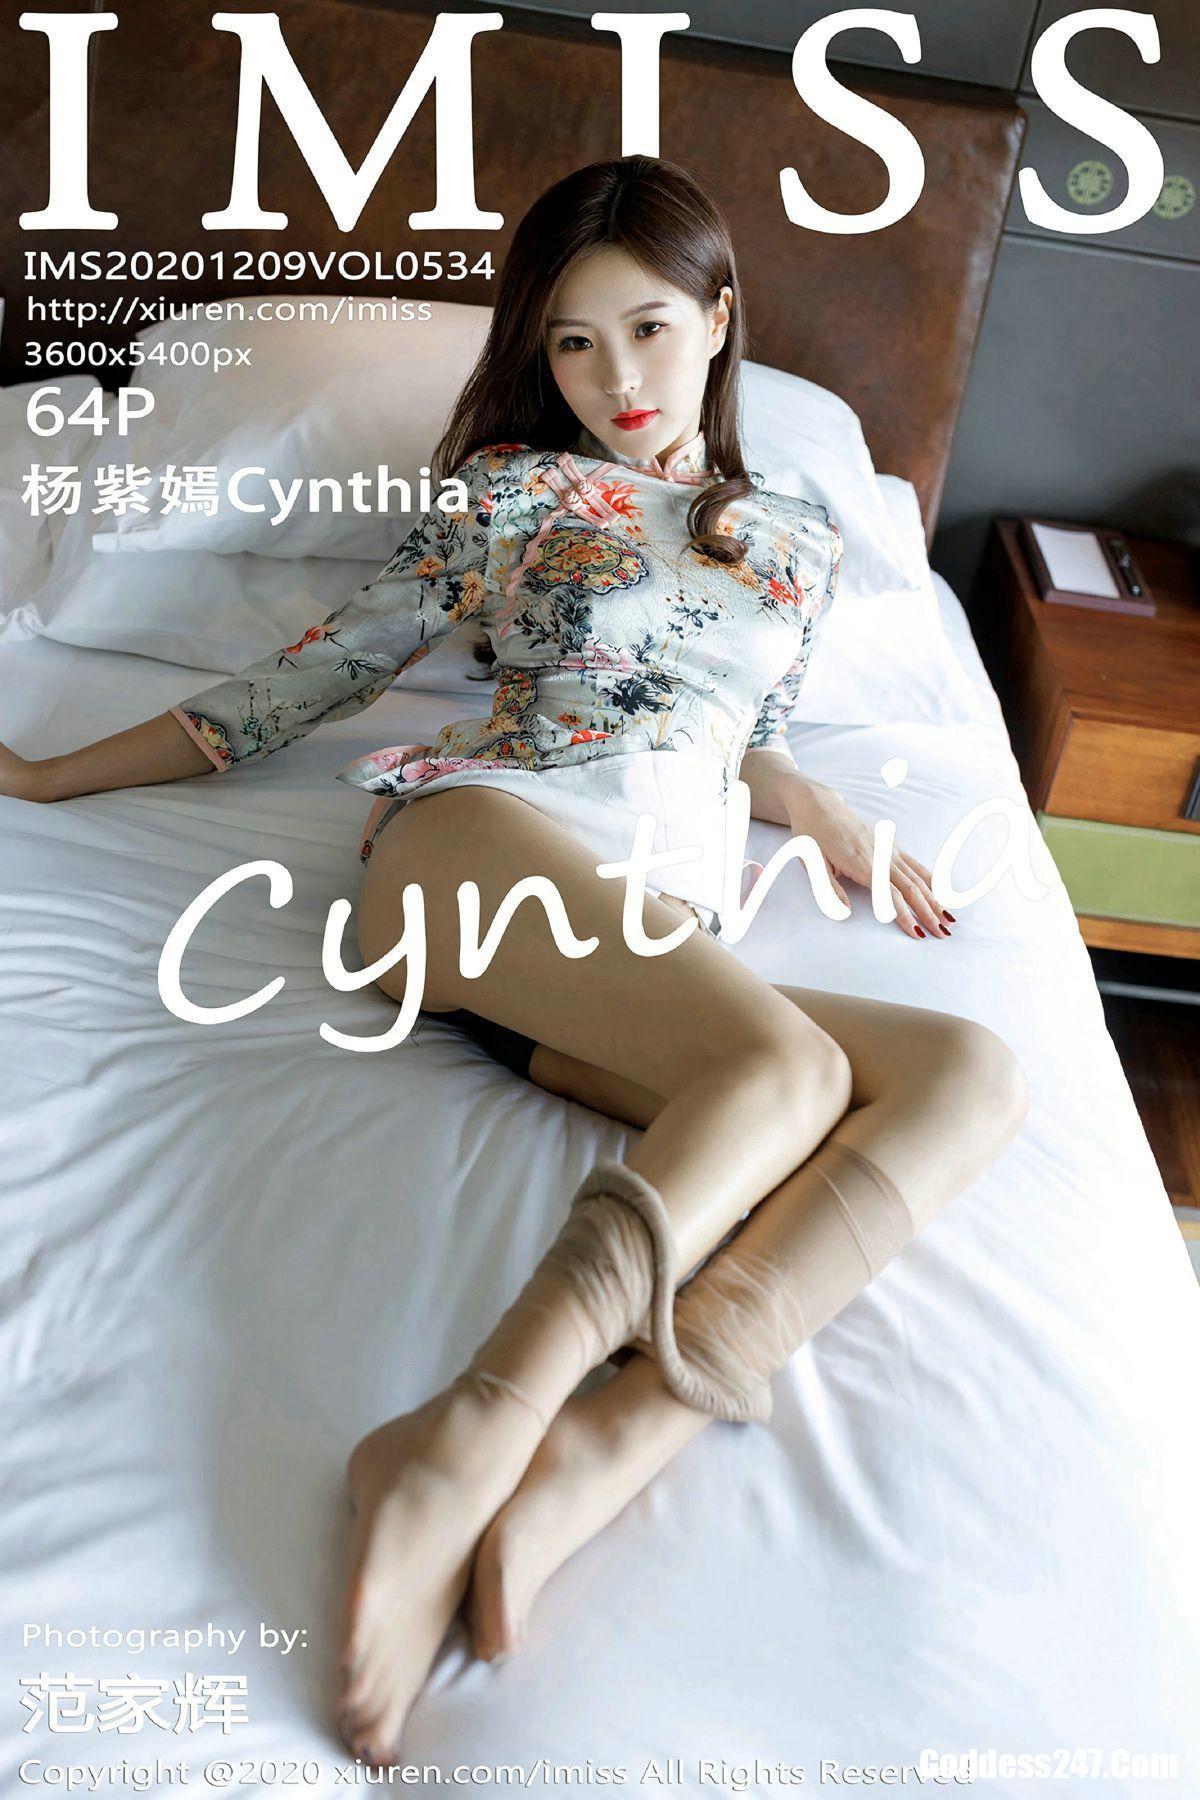 IMiss爱蜜社 Vol.534 杨紫嫣Cynthia